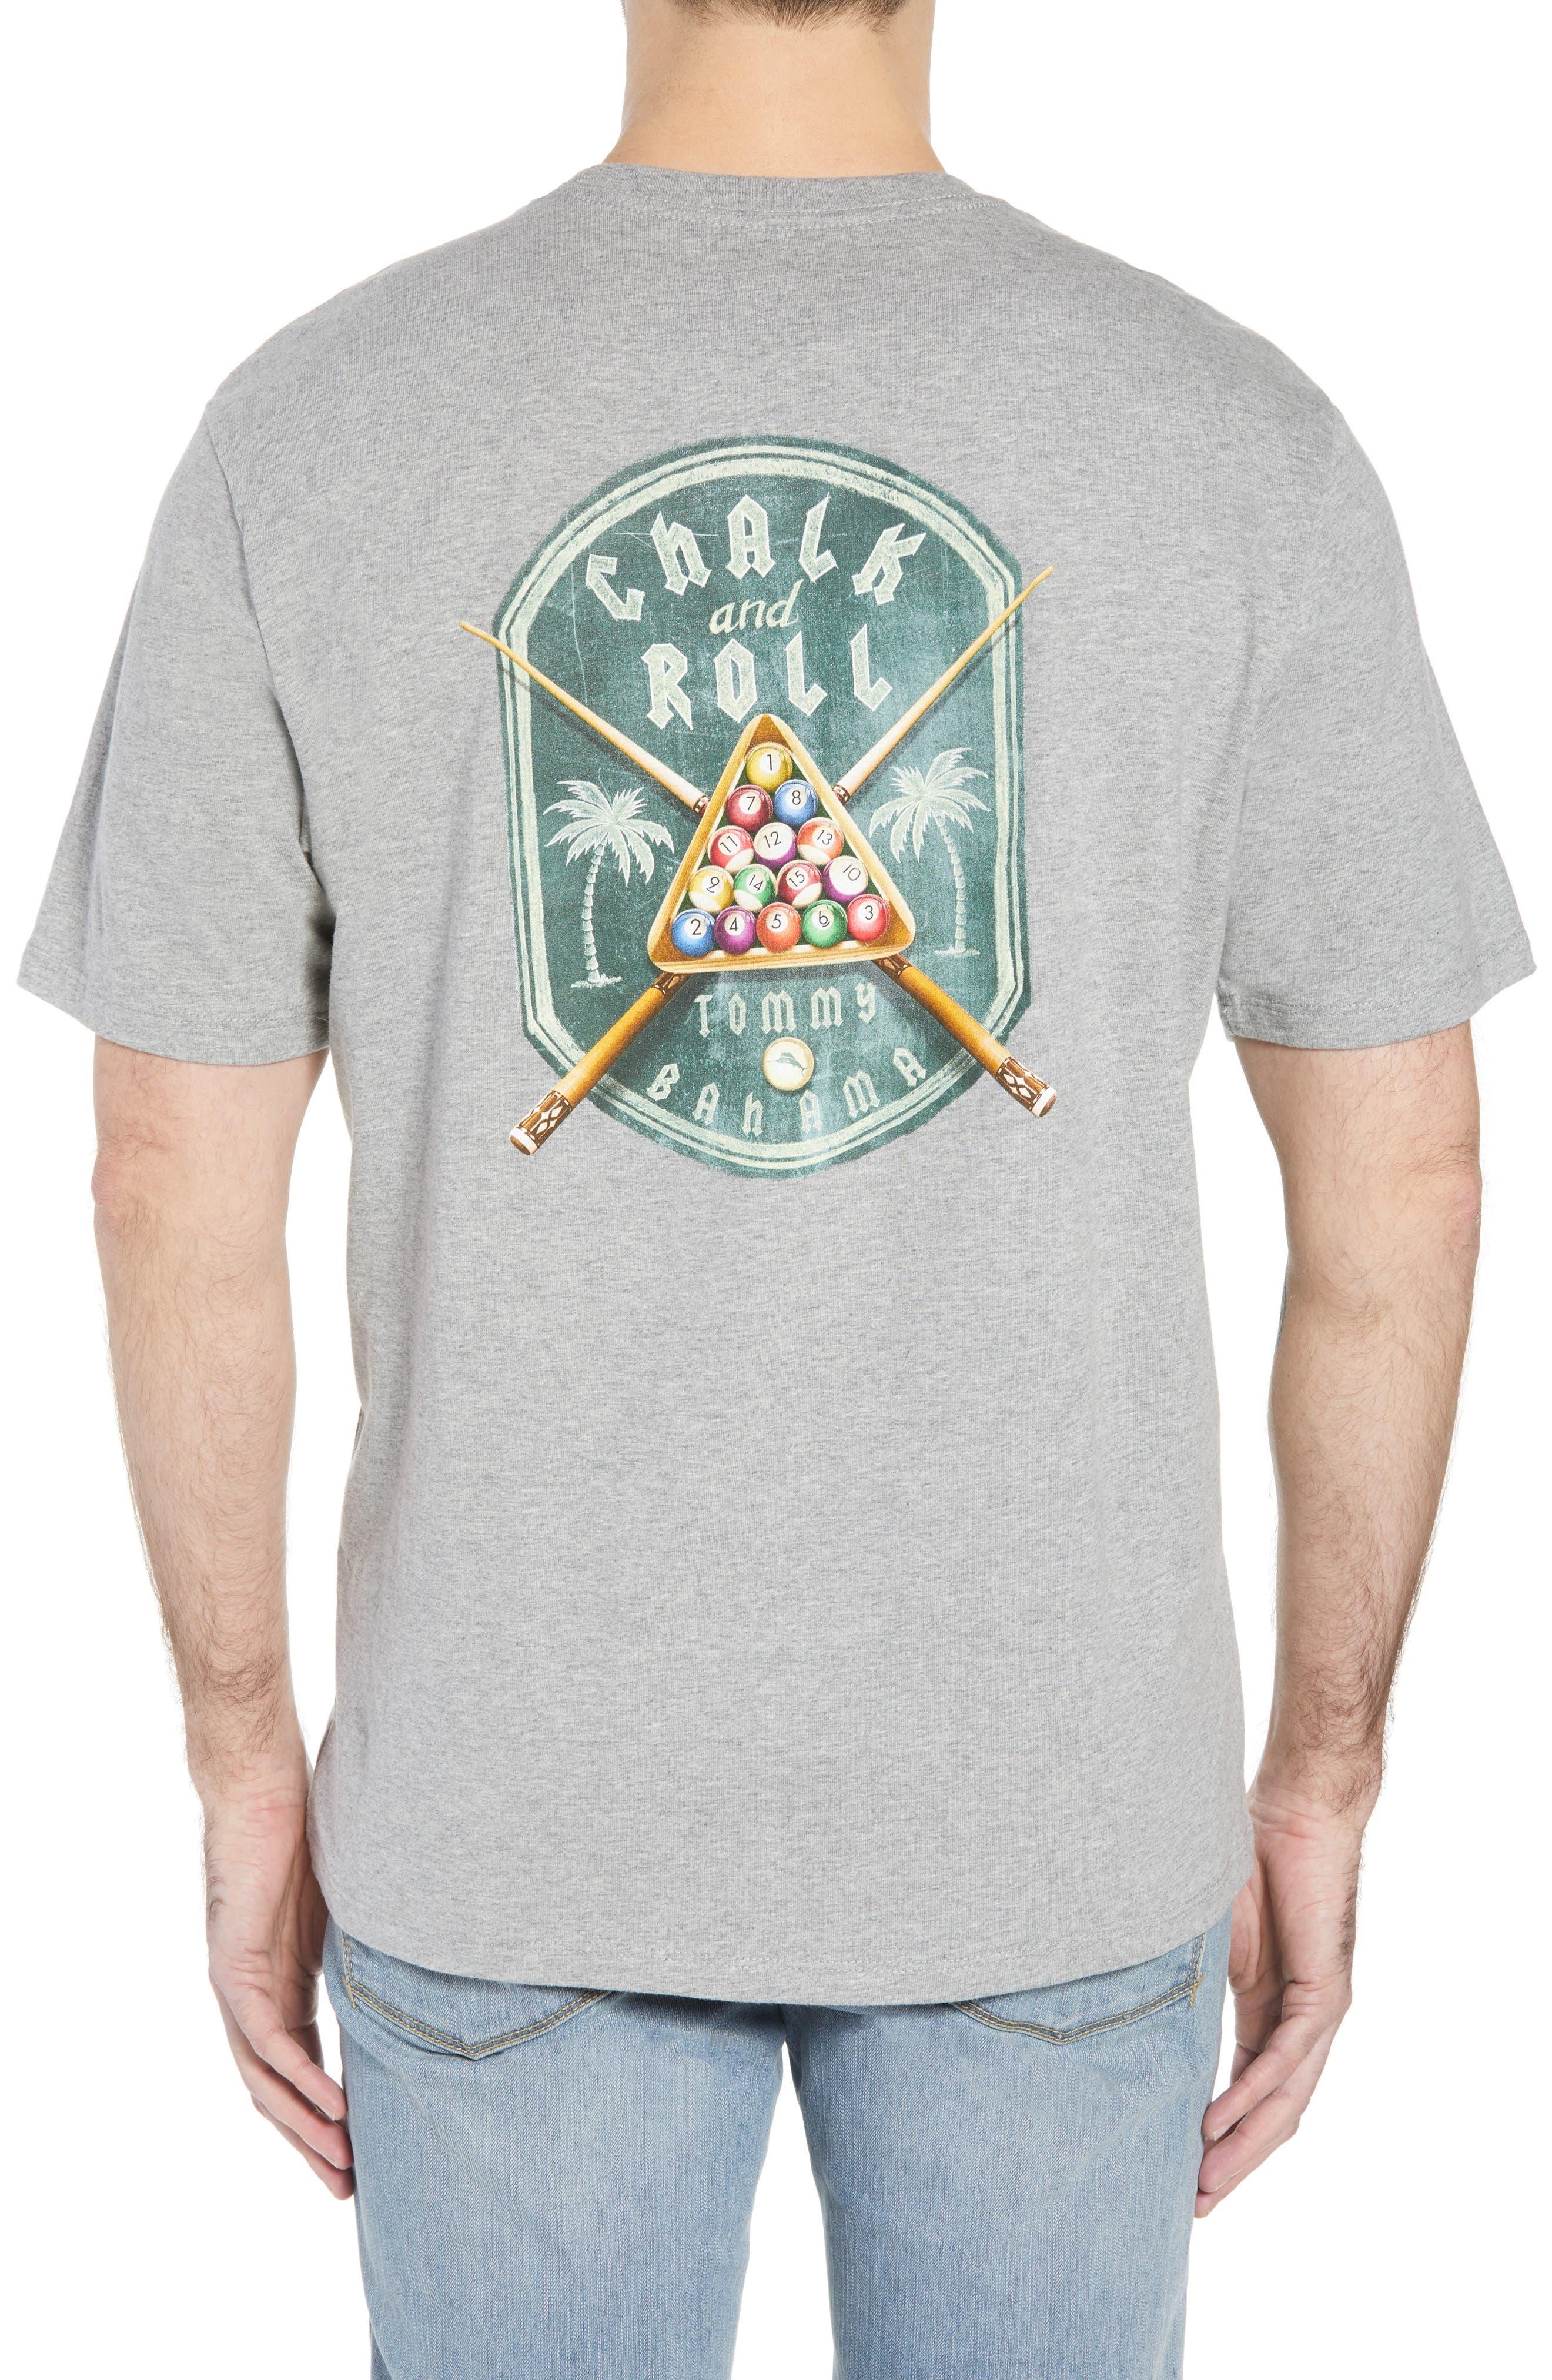 Chalk & Roll T-Shirt,                             Alternate thumbnail 4, color,